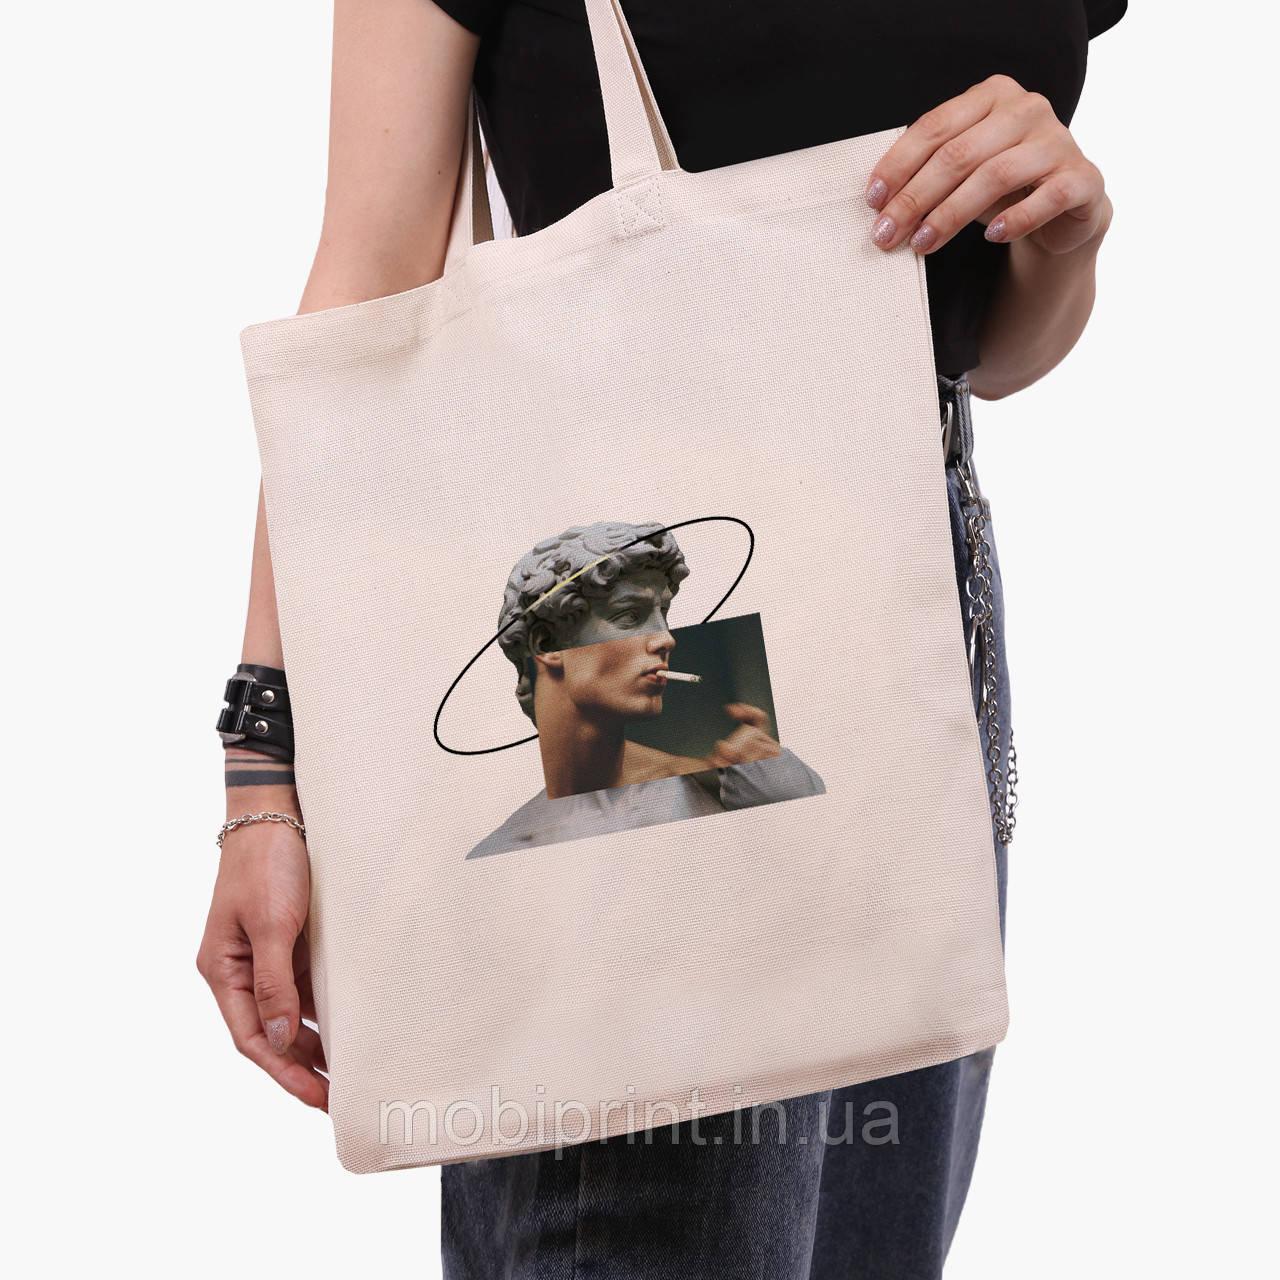 Эко сумка шоппер Давид Микеланджело - Ренессанс (David Michelangelo) (9227-1201)  экосумка шопер 41*35 см